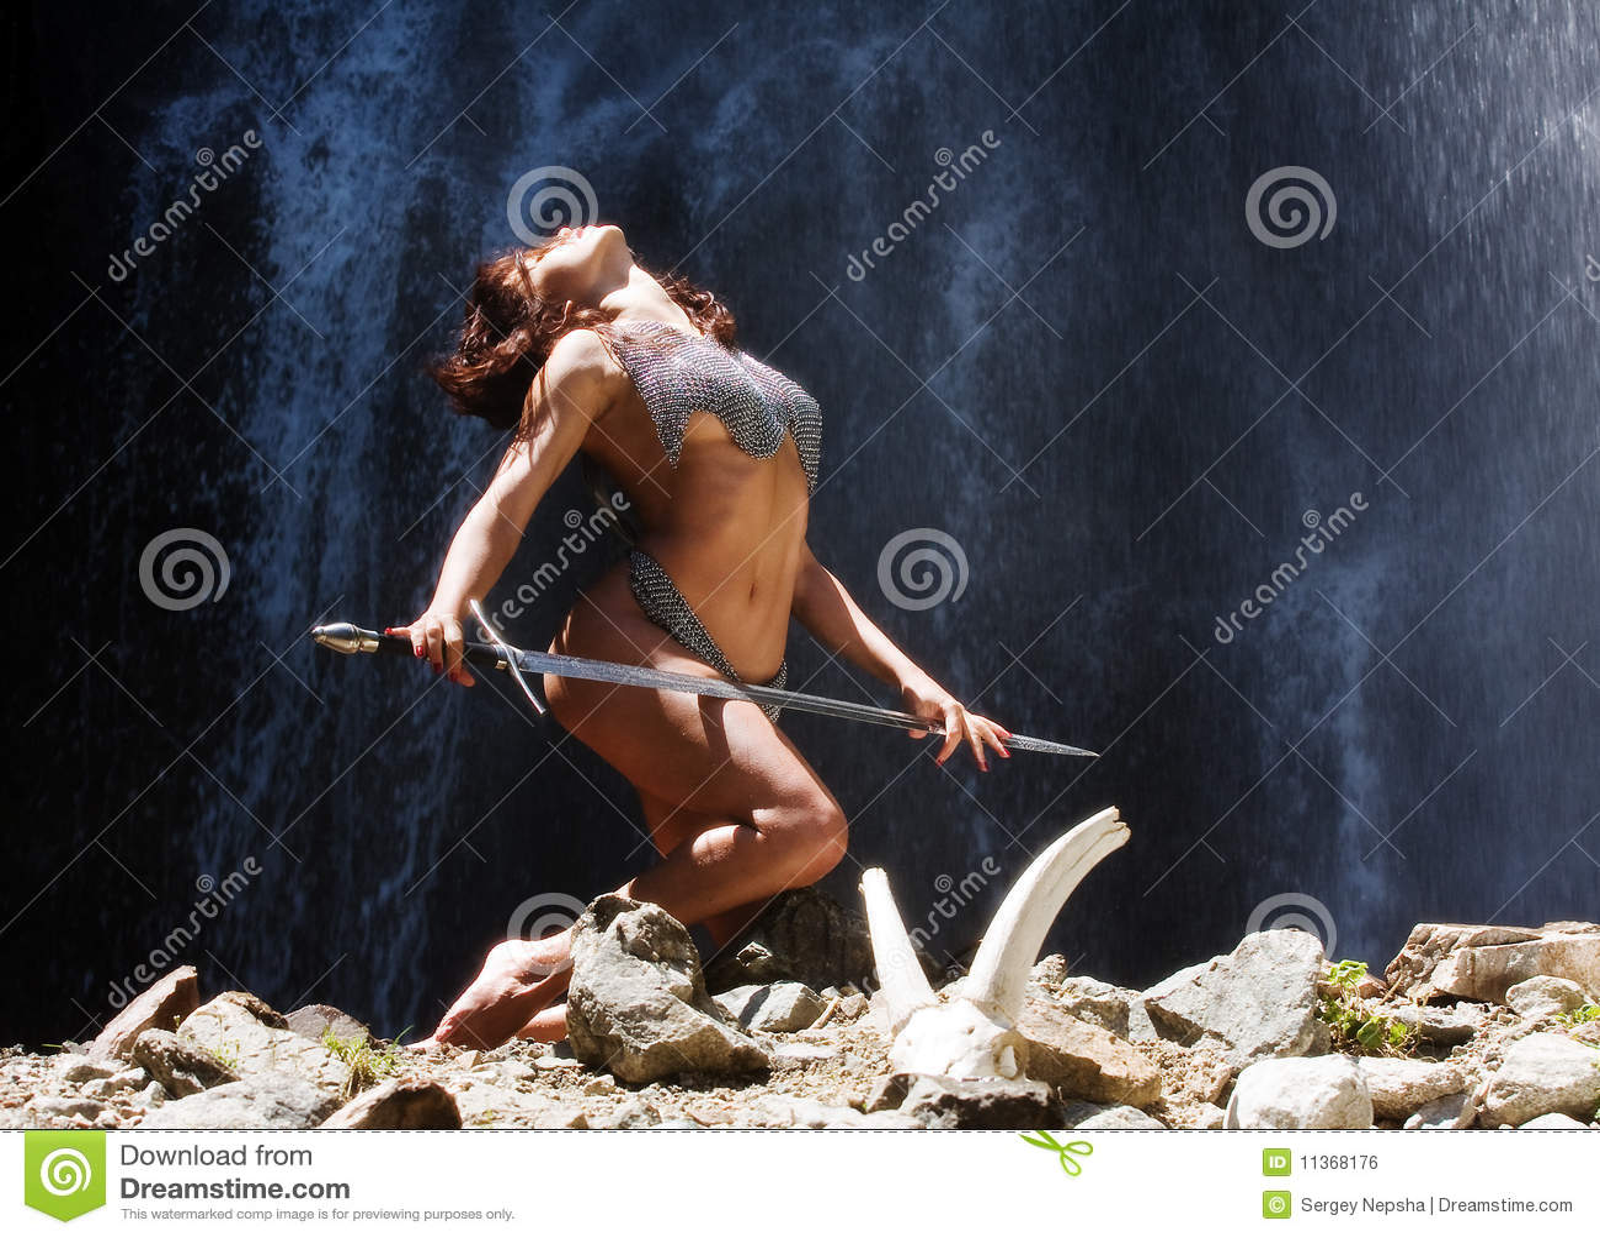 Warrior women nude foto blog naked movies